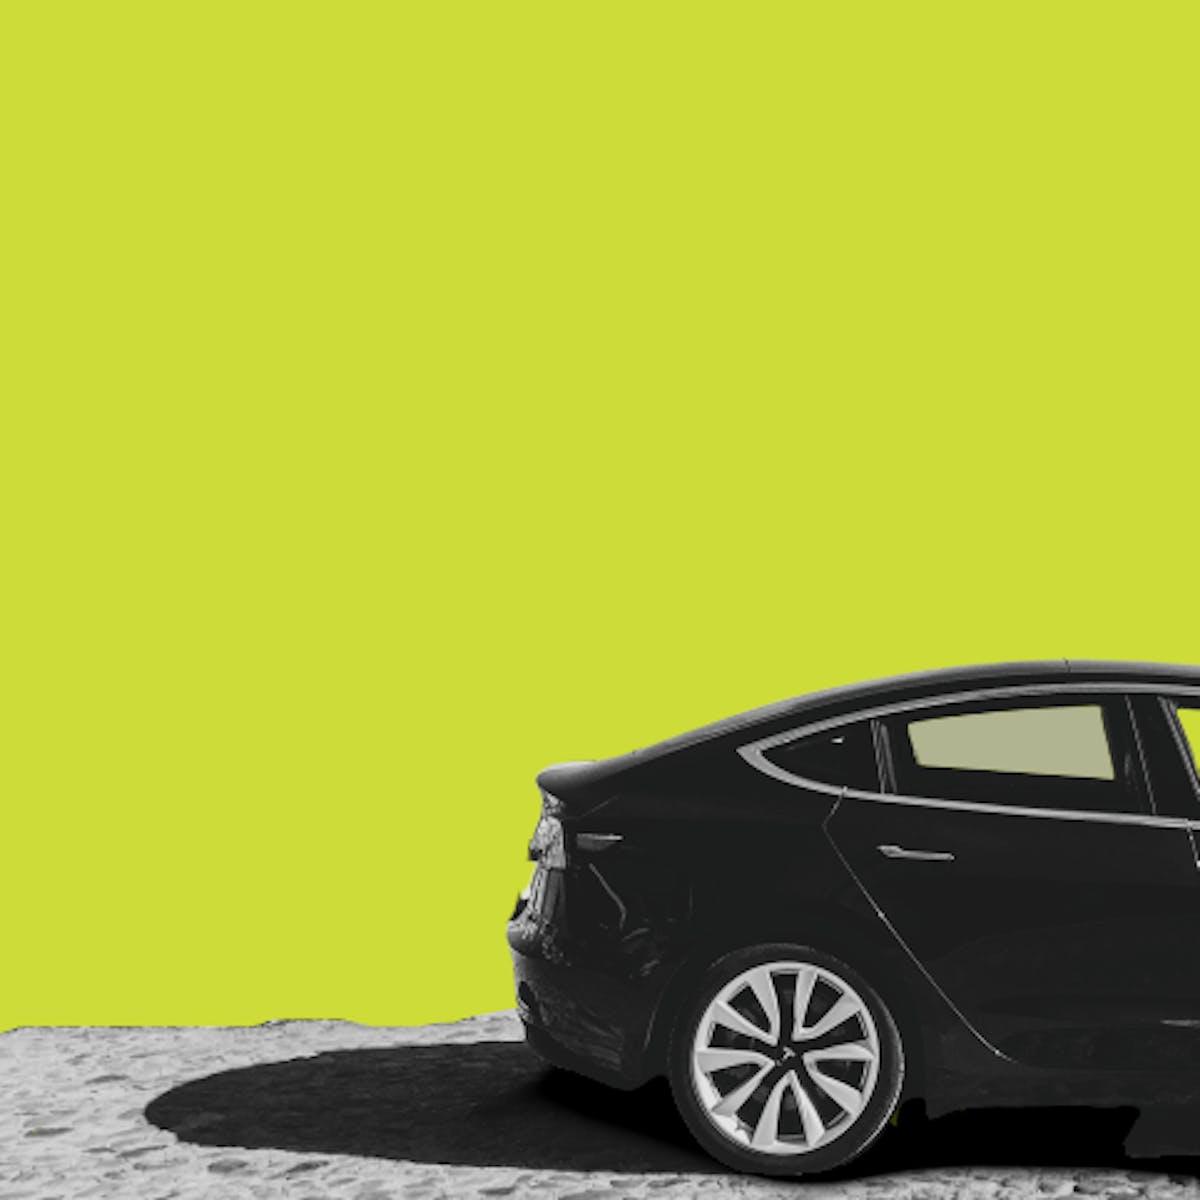 Down Under, Electric Vehicle Misinformation Muddies the Debate